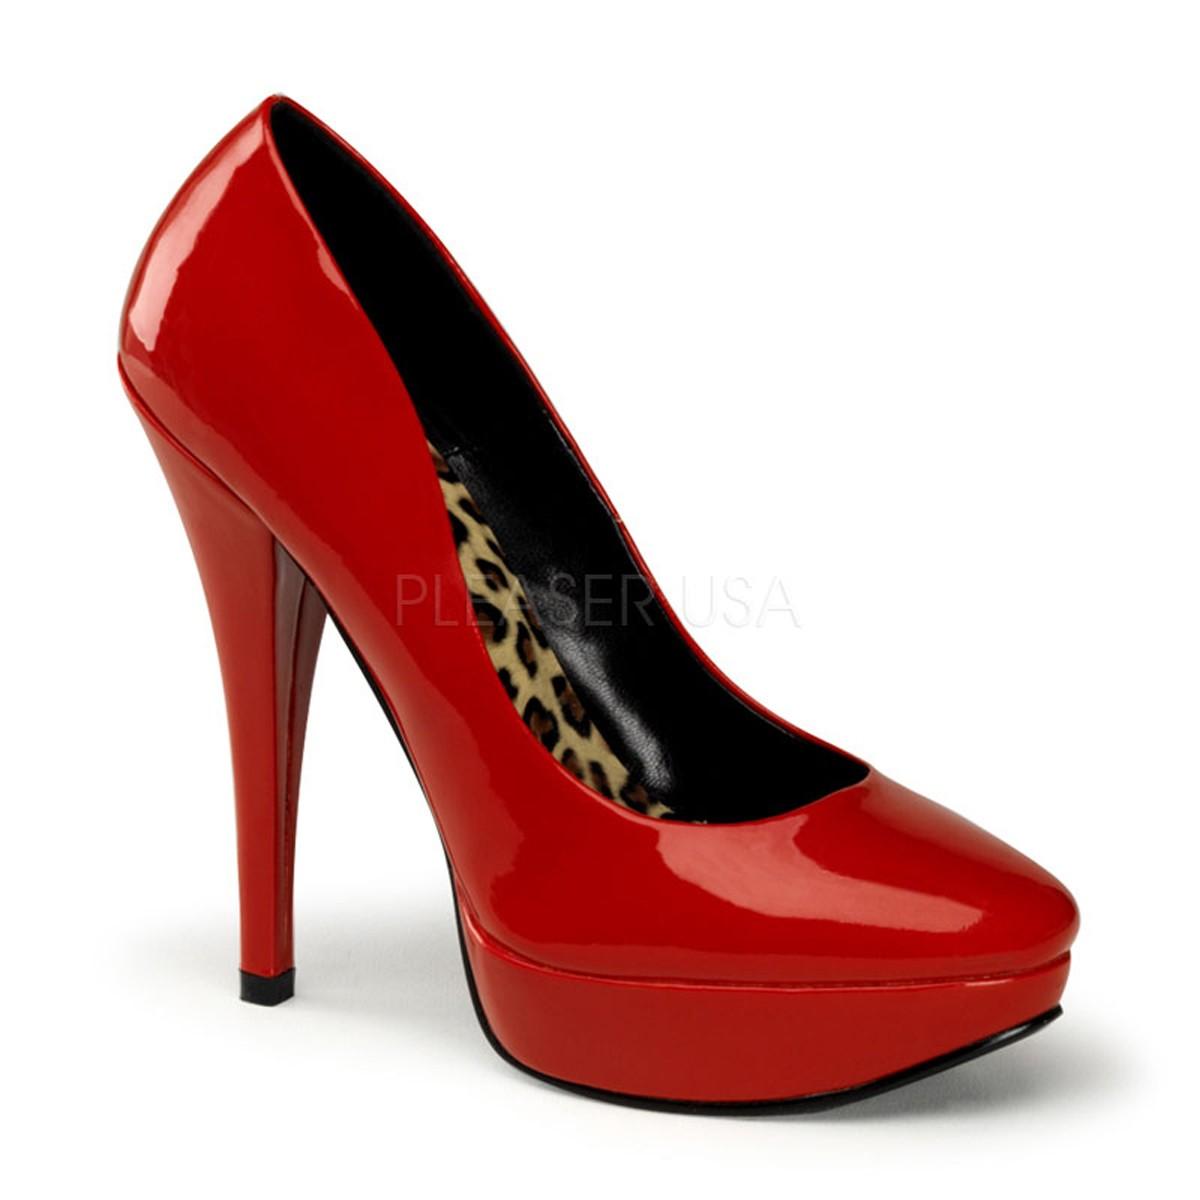 Zapatos Plataformas Pin Up Couture HARLOW 01 Rojo barniz